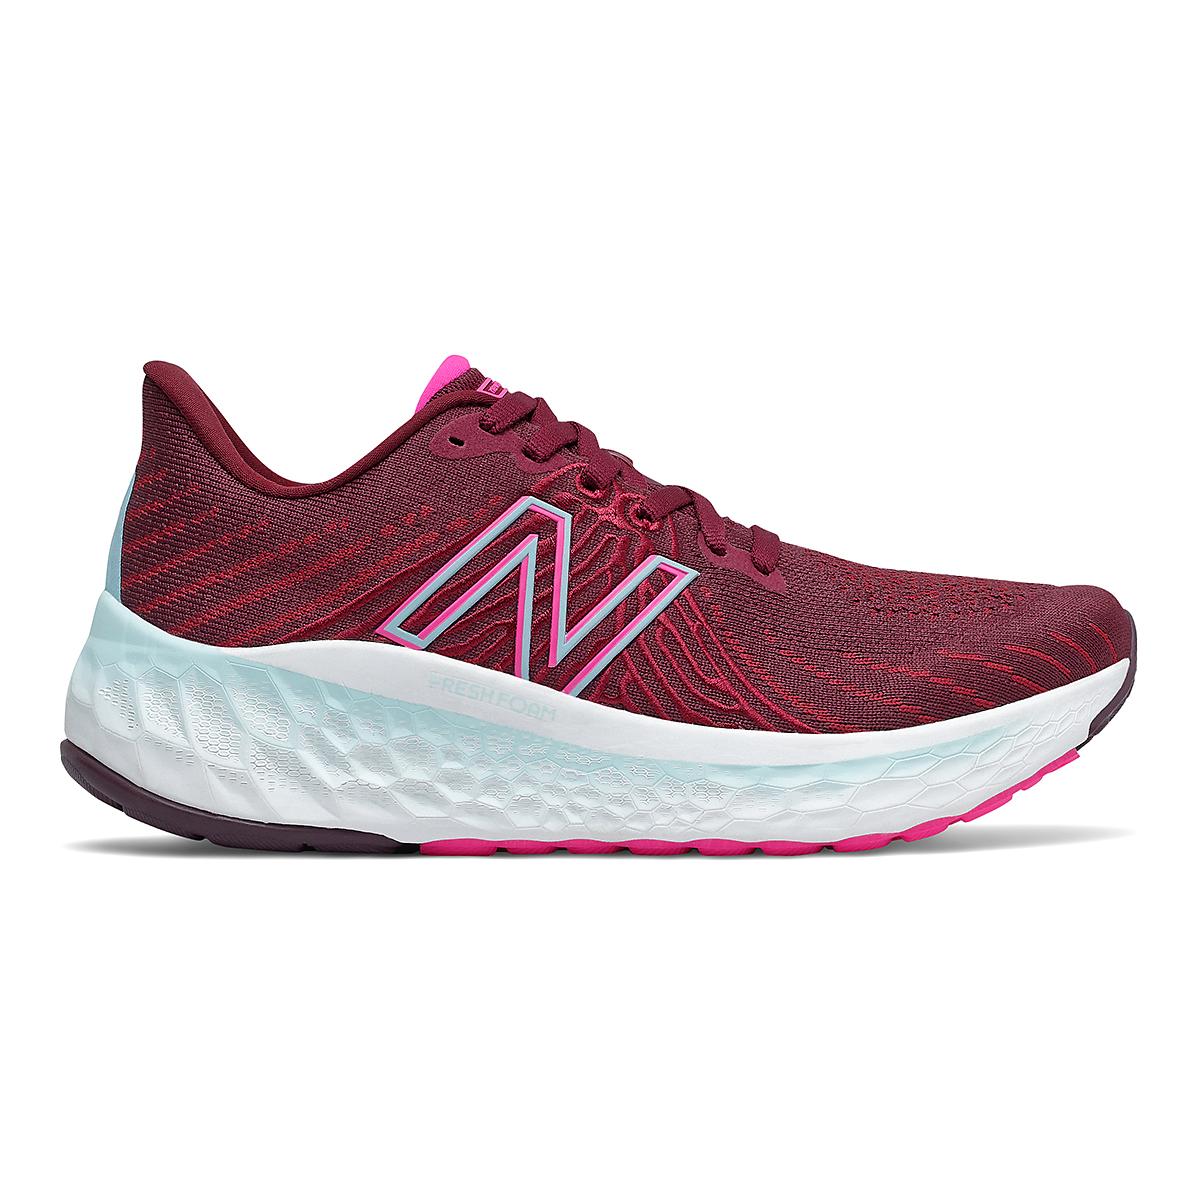 Women's New Balance Fresh Foam Vongo V5 Running Shoe - Color: Garnet/Pink Glo - Size: 5 - Width: Regular, Garnet/Pink Glo, large, image 1